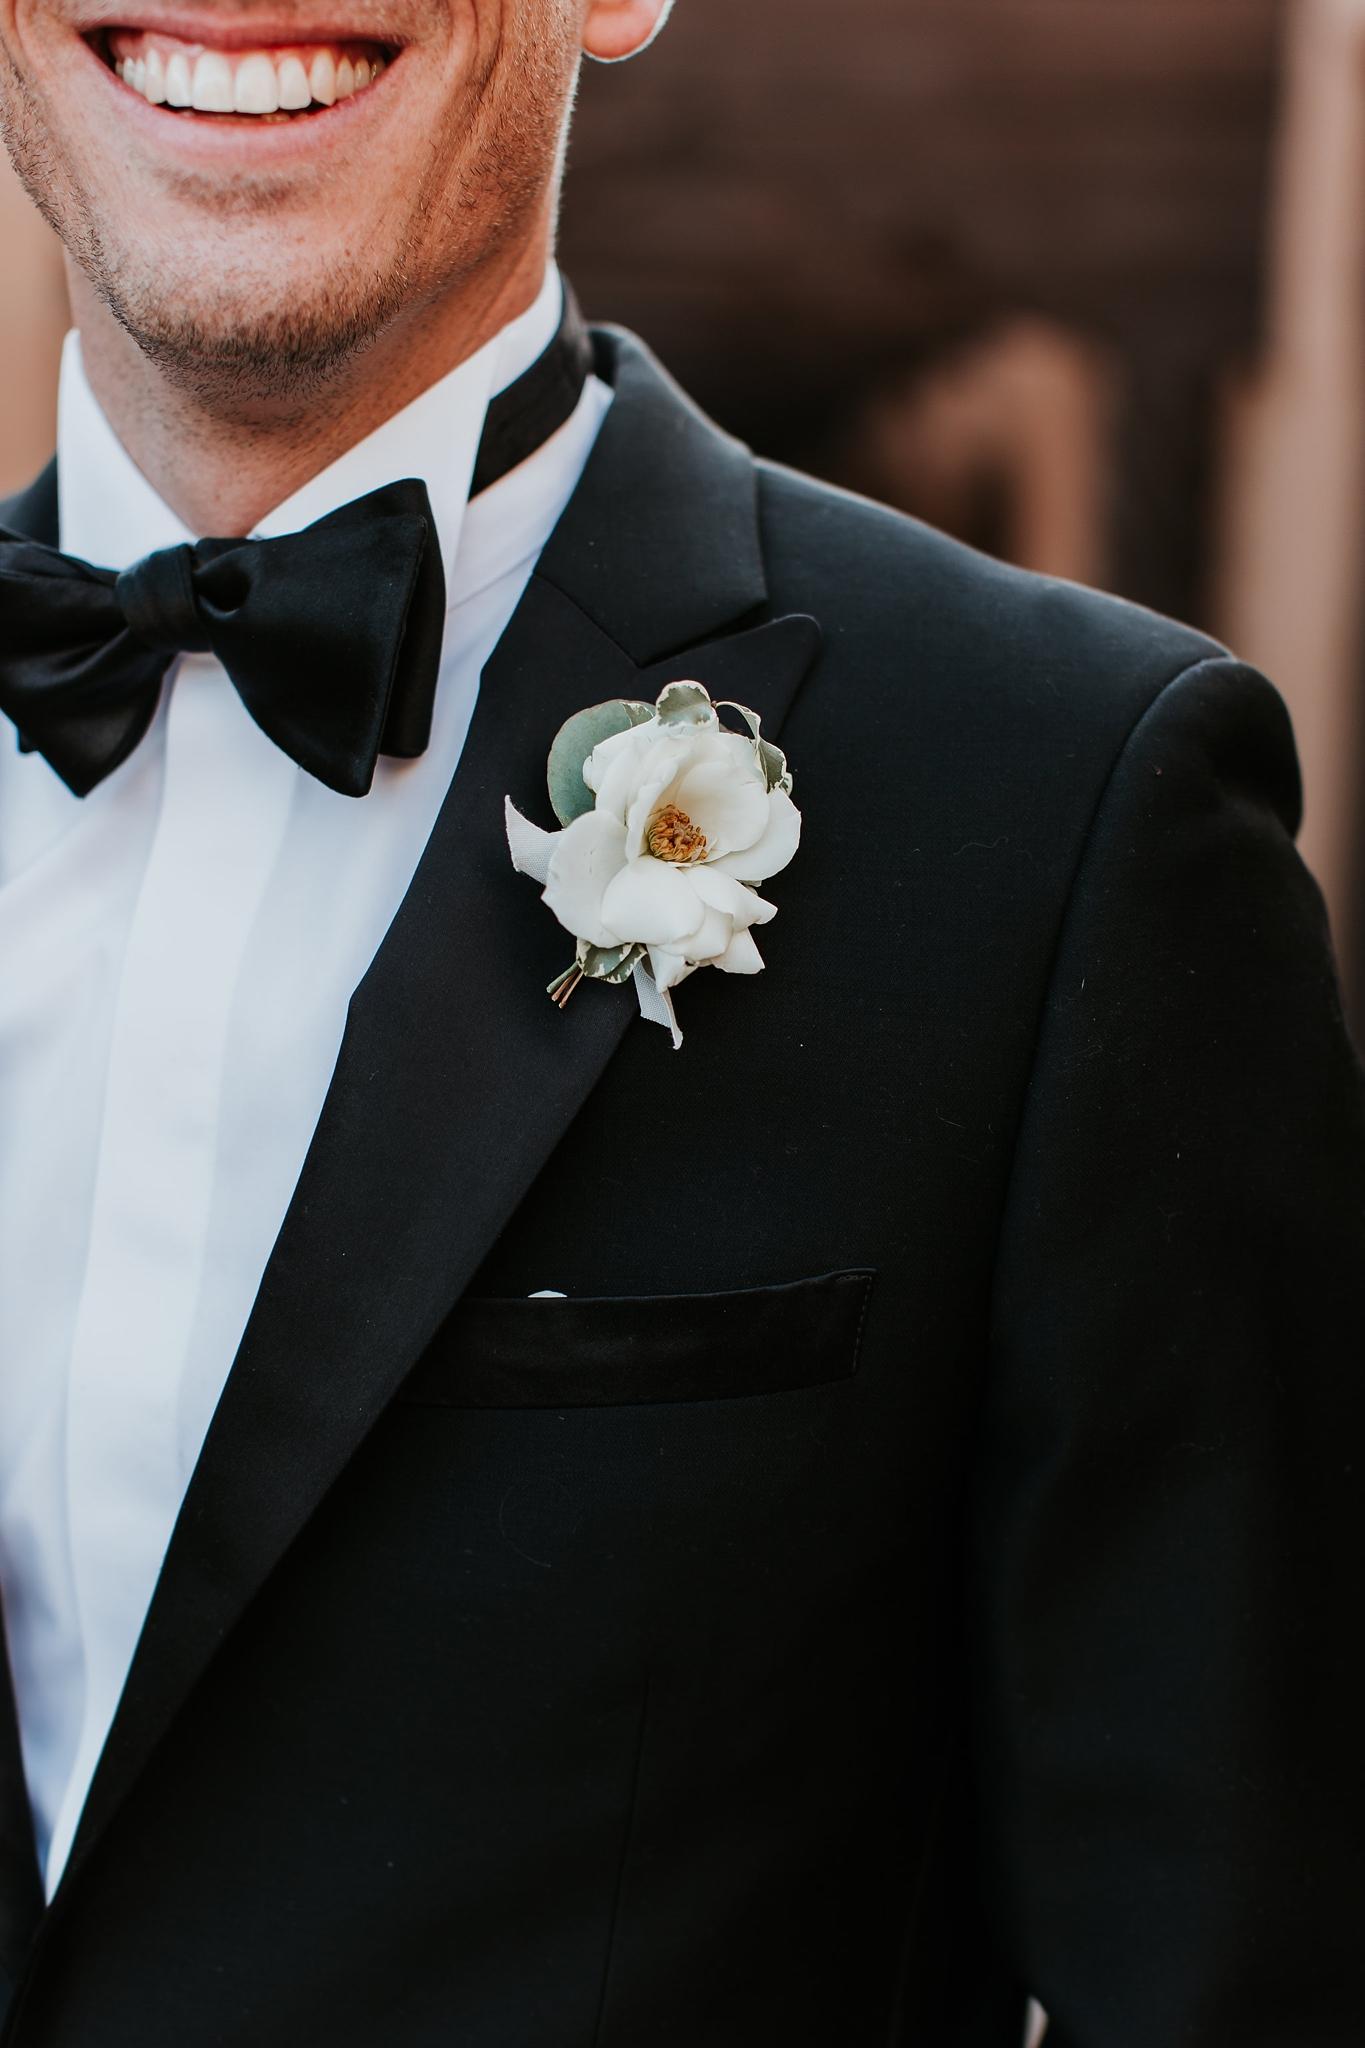 Alicia+lucia+photography+-+albuquerque+wedding+photographer+-+santa+fe+wedding+photography+-+new+mexico+wedding+photographer+-+new+mexico+wedding+-+wedding+-+groom+-+groom+style+-+wedding+style_0098.jpg